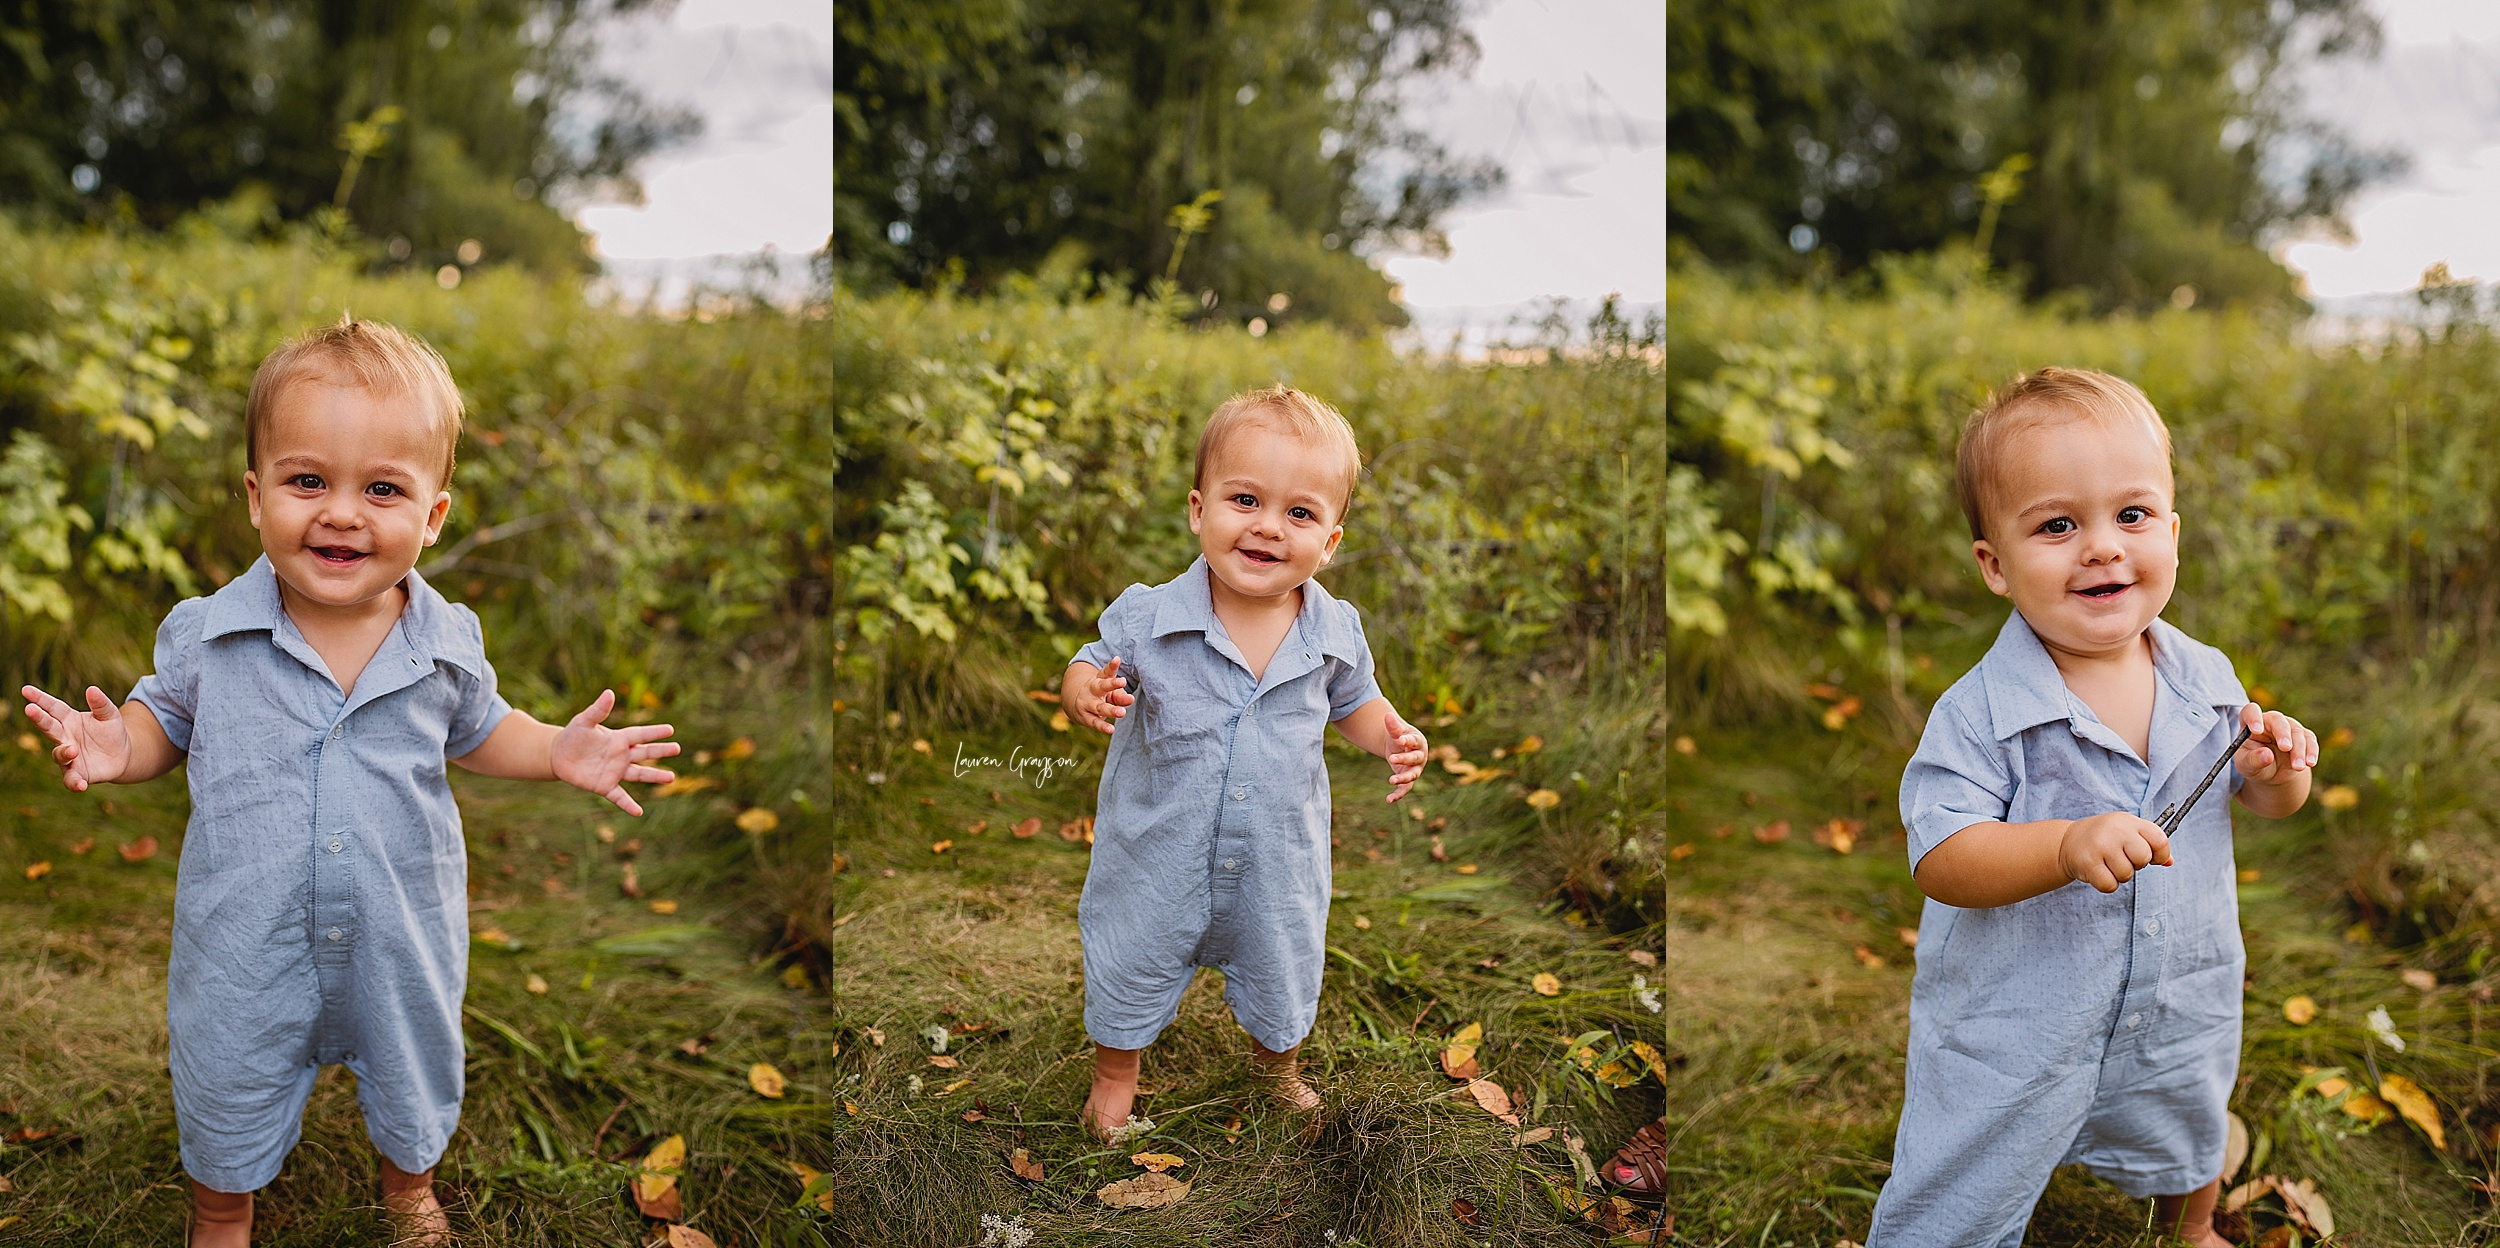 lauren-grayson-photography-cleveland-ohio-photographer-AKRON-family-photos-springfield-bog-cullin-first-birthday_0810.jpg